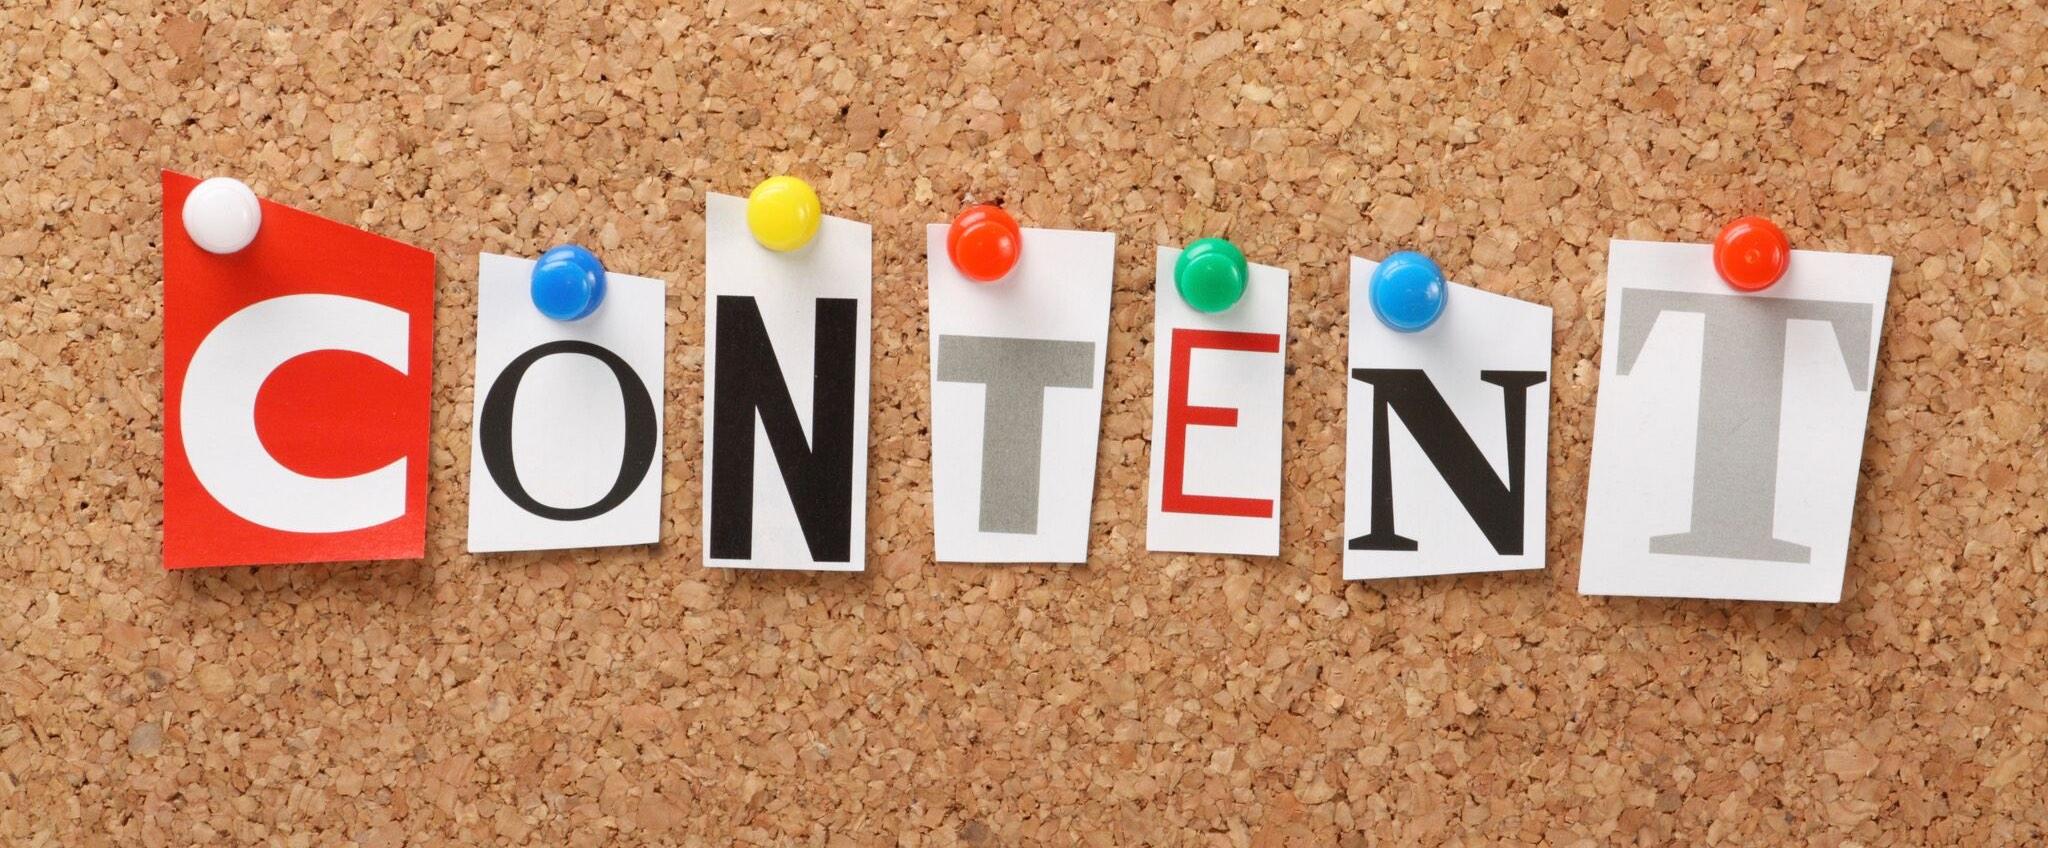 Content-Marketing-Tipps